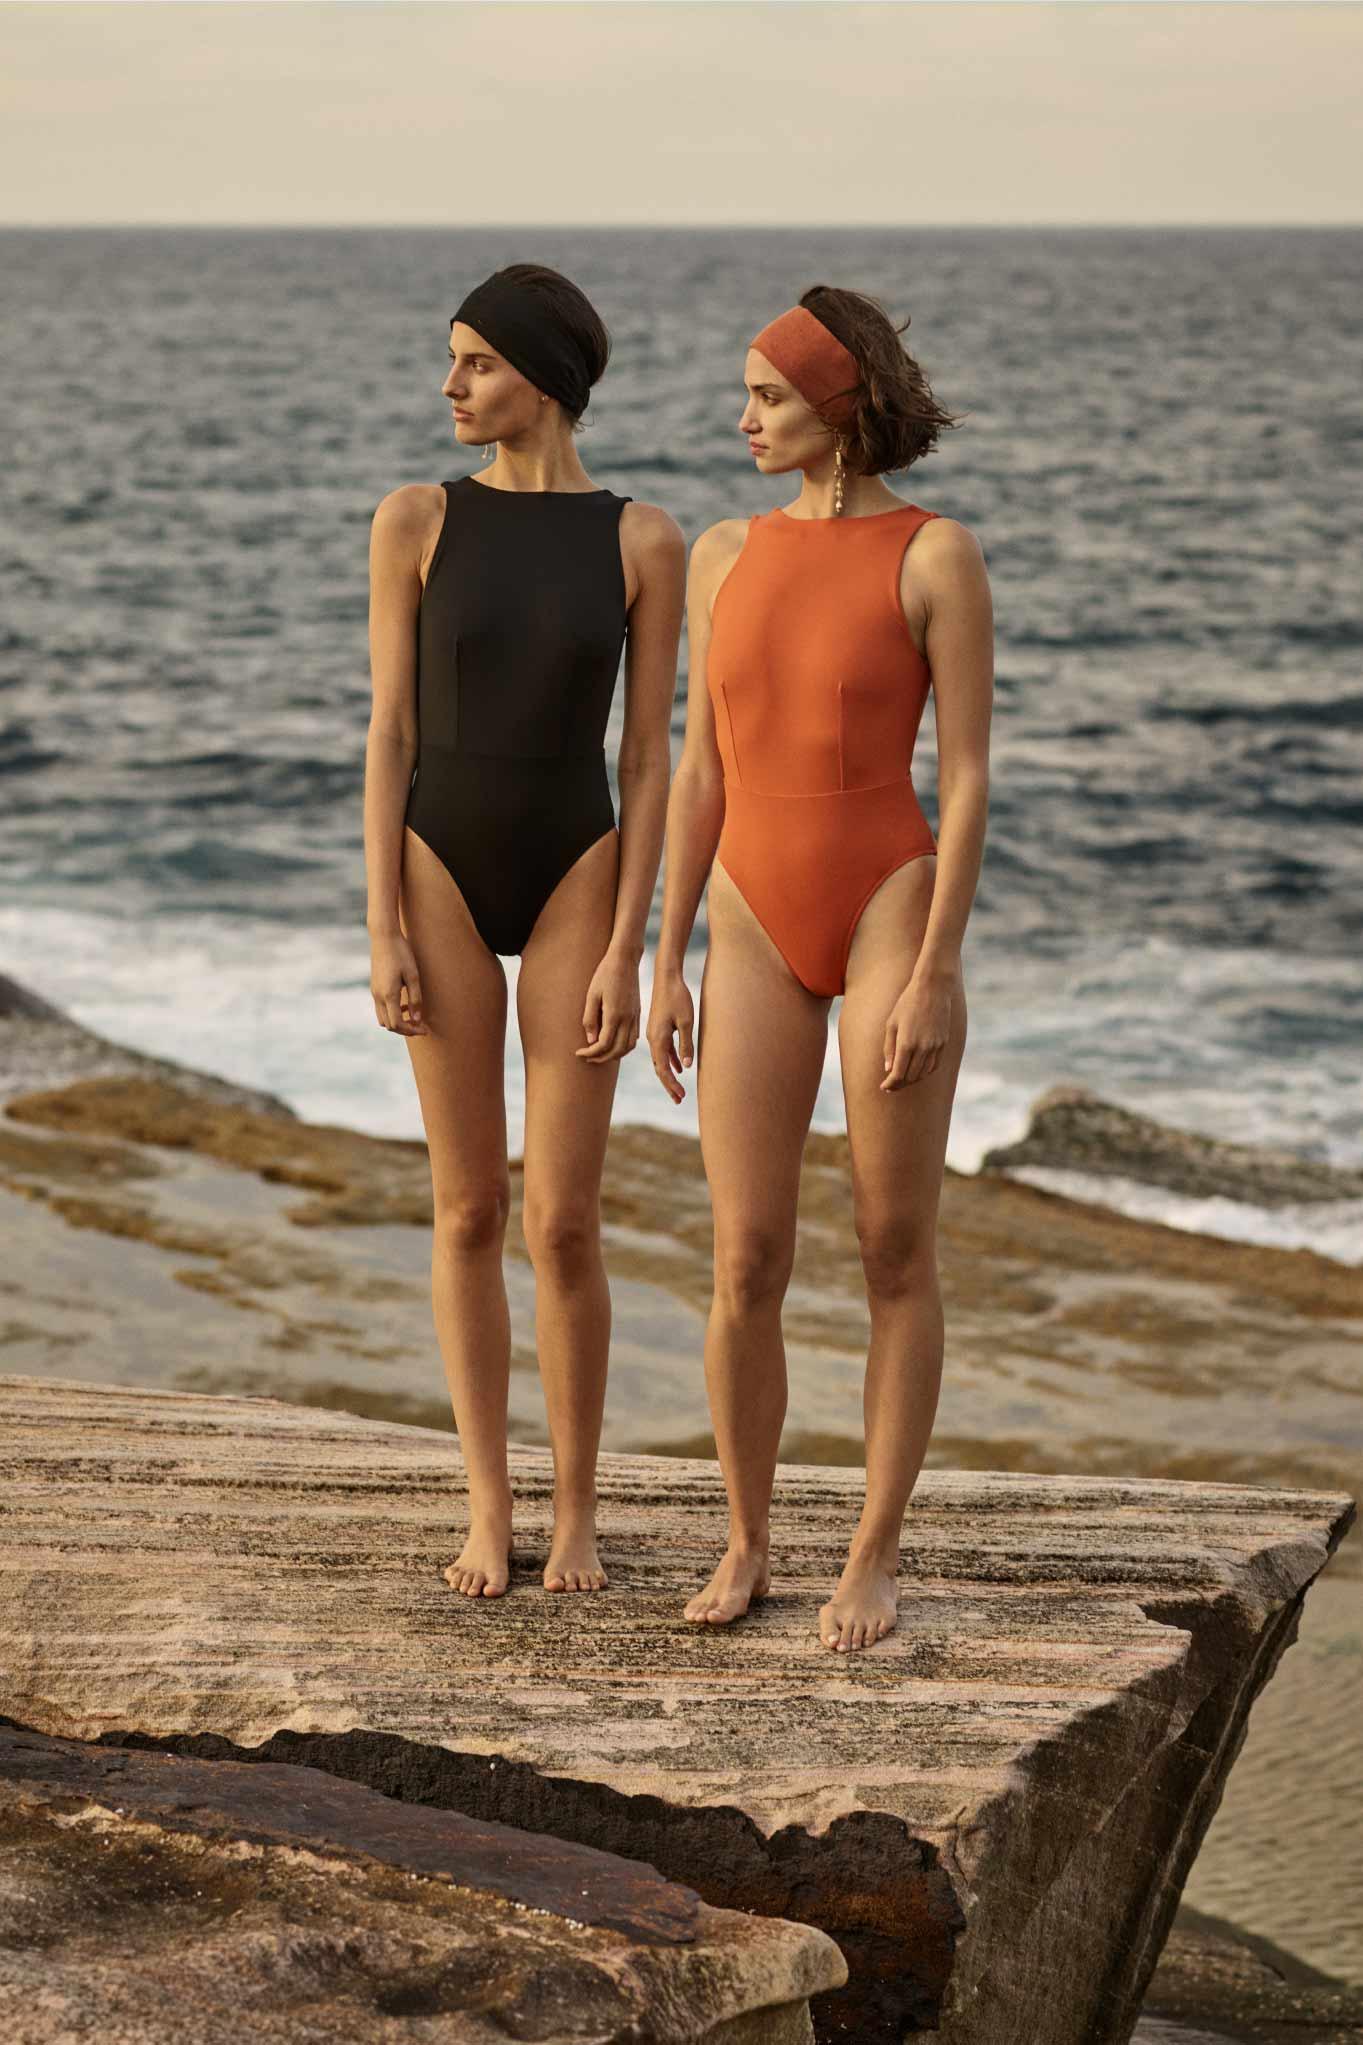 BONDI BORN Luxury Australian swimwear made in Australia from luxury sustainably produced fabrics.